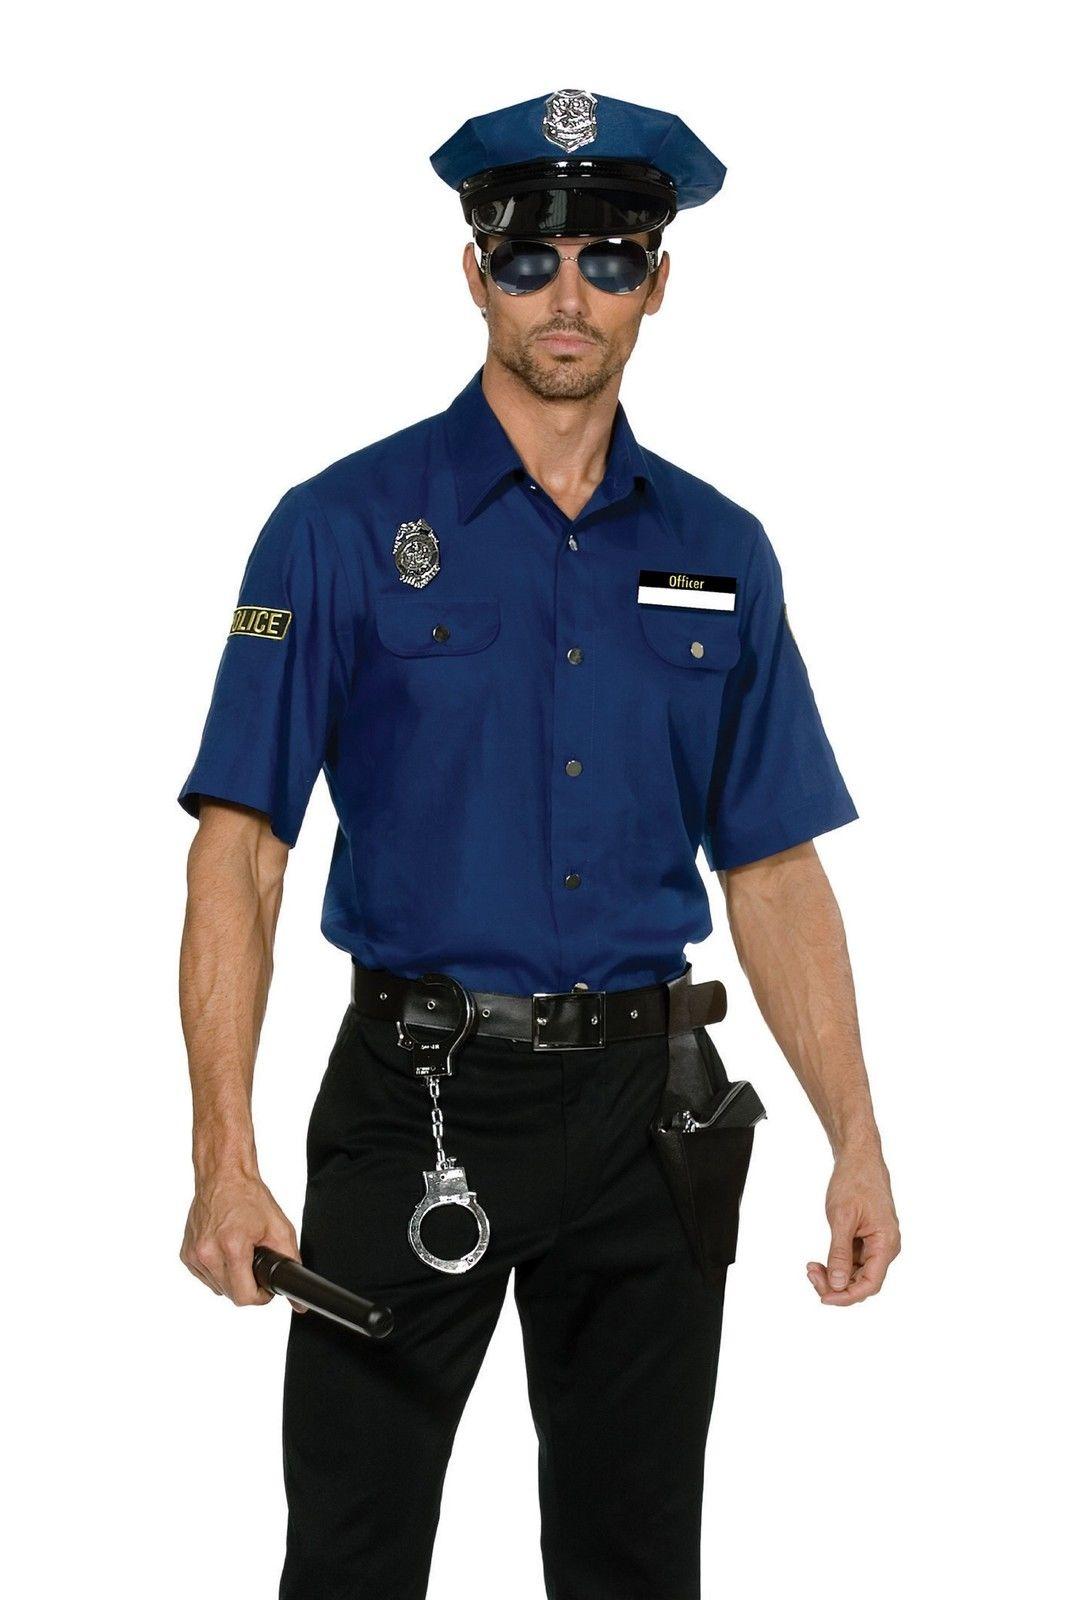 Police man costume 5150 Edmonton